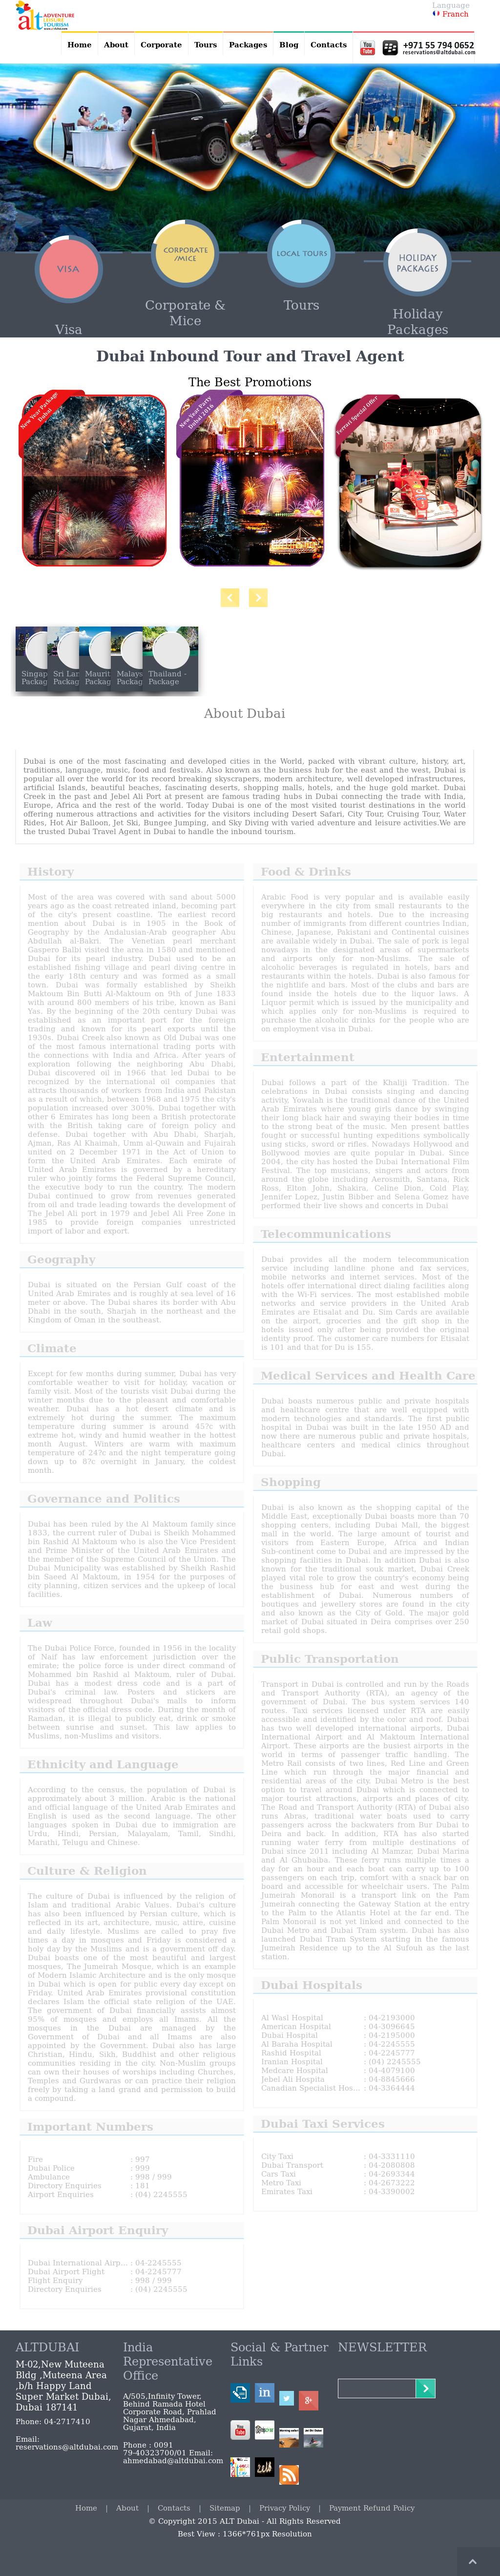 Altdubai Competitors, Revenue and Employees - Owler Company